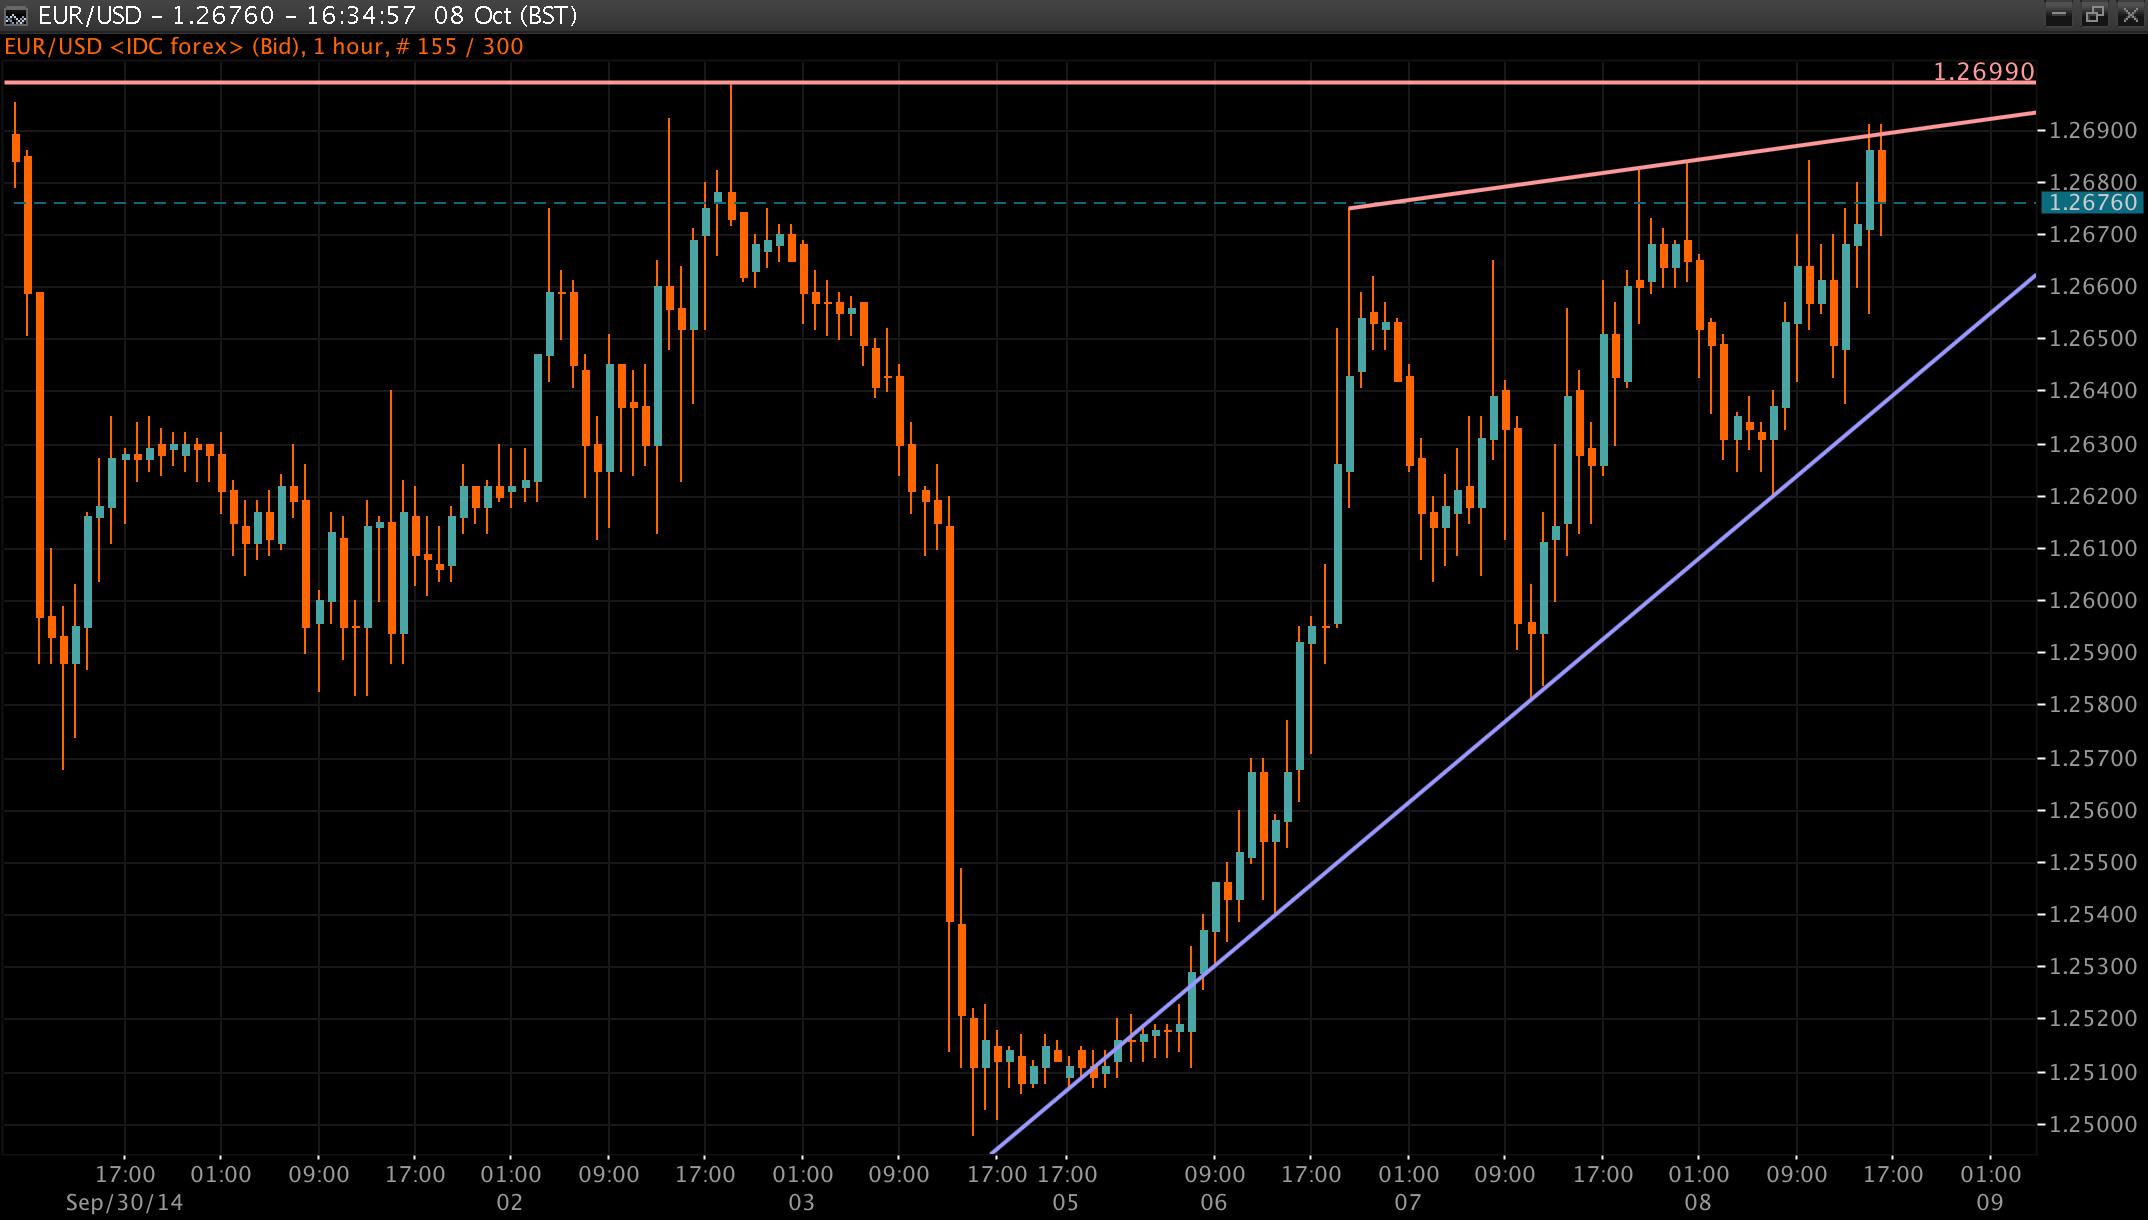 EUR/USD Chart 09 Oct 2014